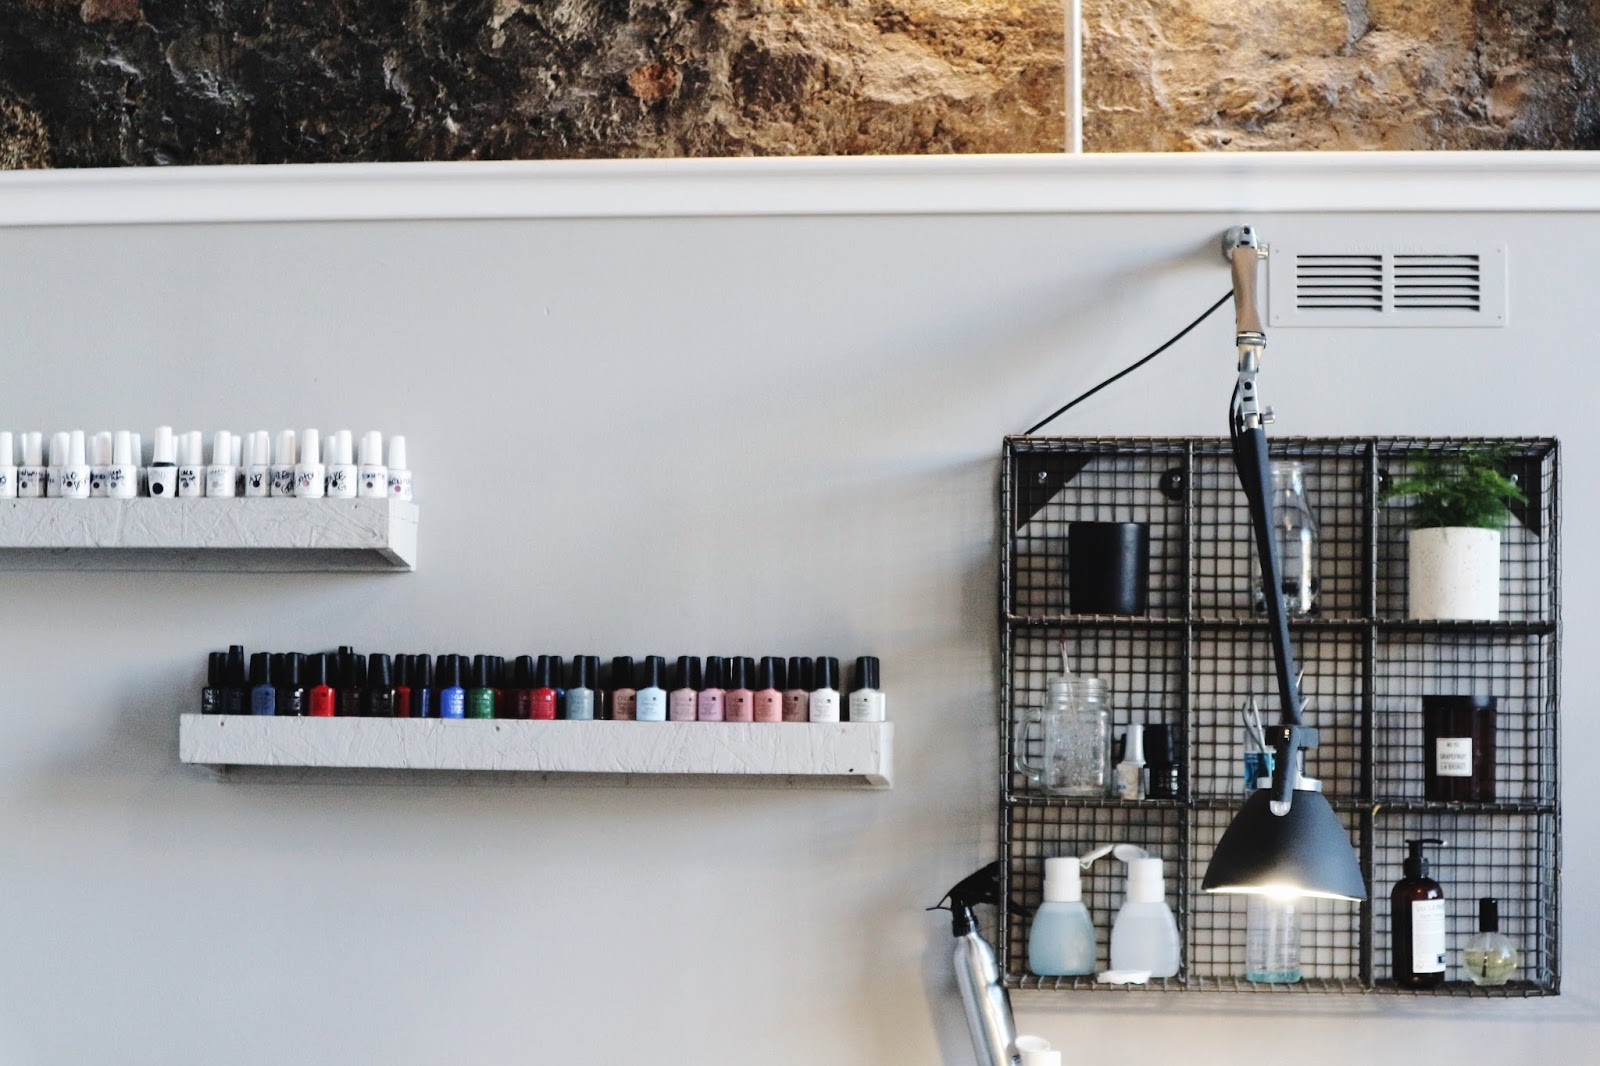 Buff, Edinburgh - The Nail Bar Of My Manicure Dreams | Megan Fife